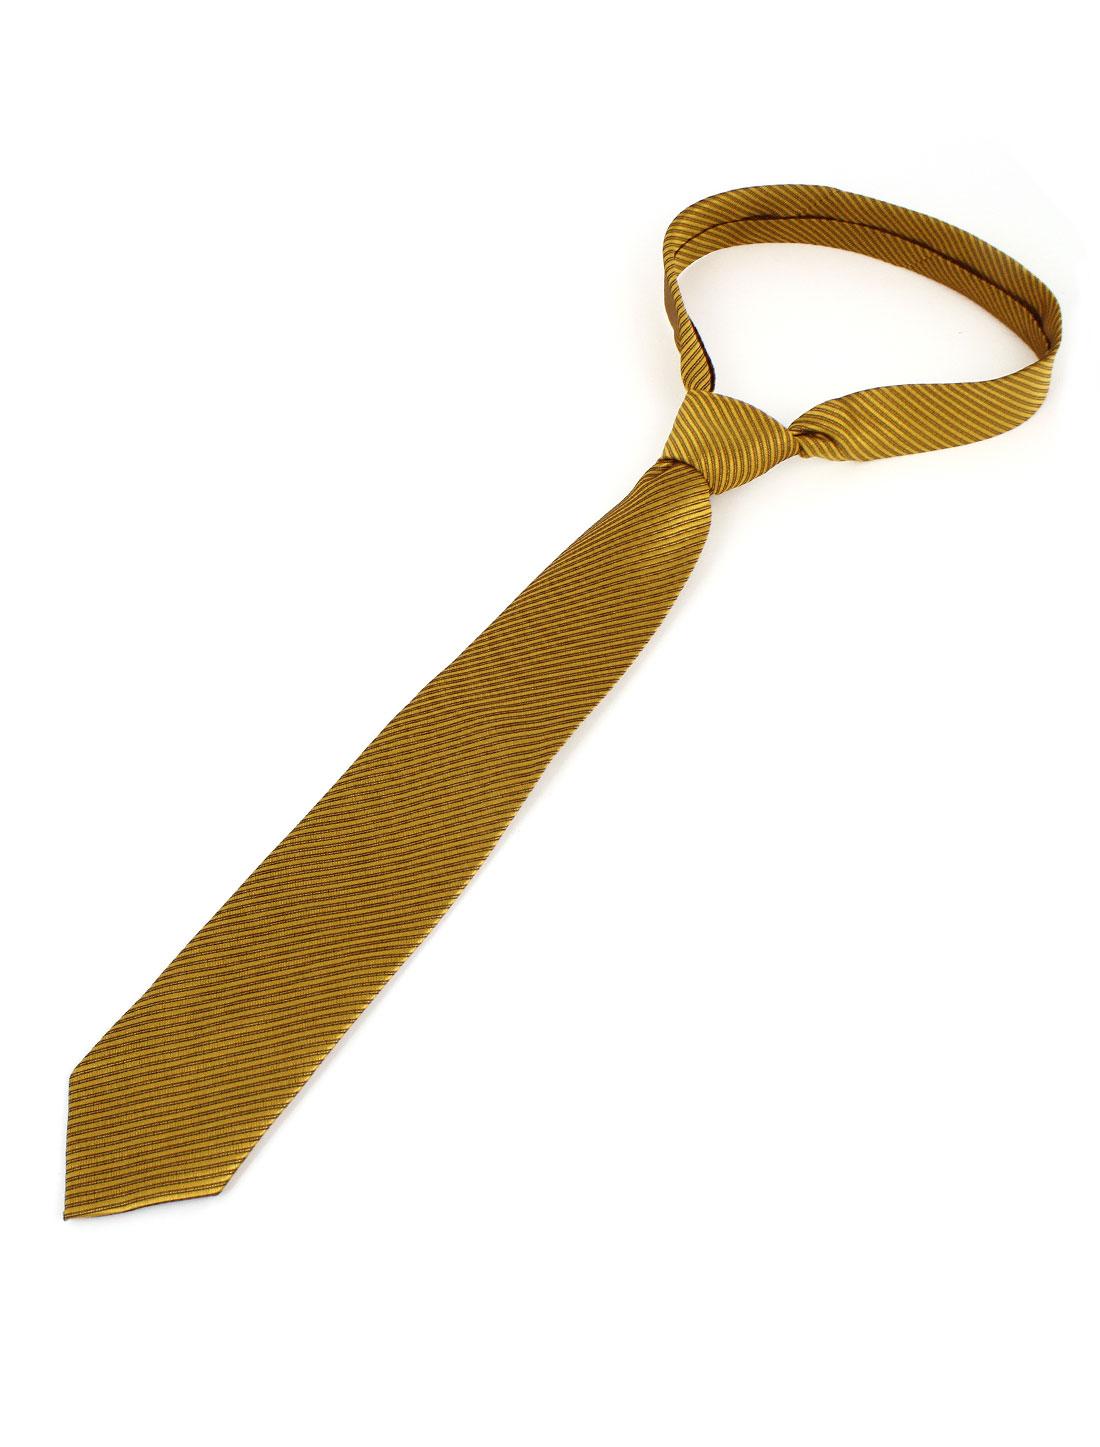 Men Twill Stripes Pattern Polyester Self Tie Adjustable Neckwear Necktie Gold Tone